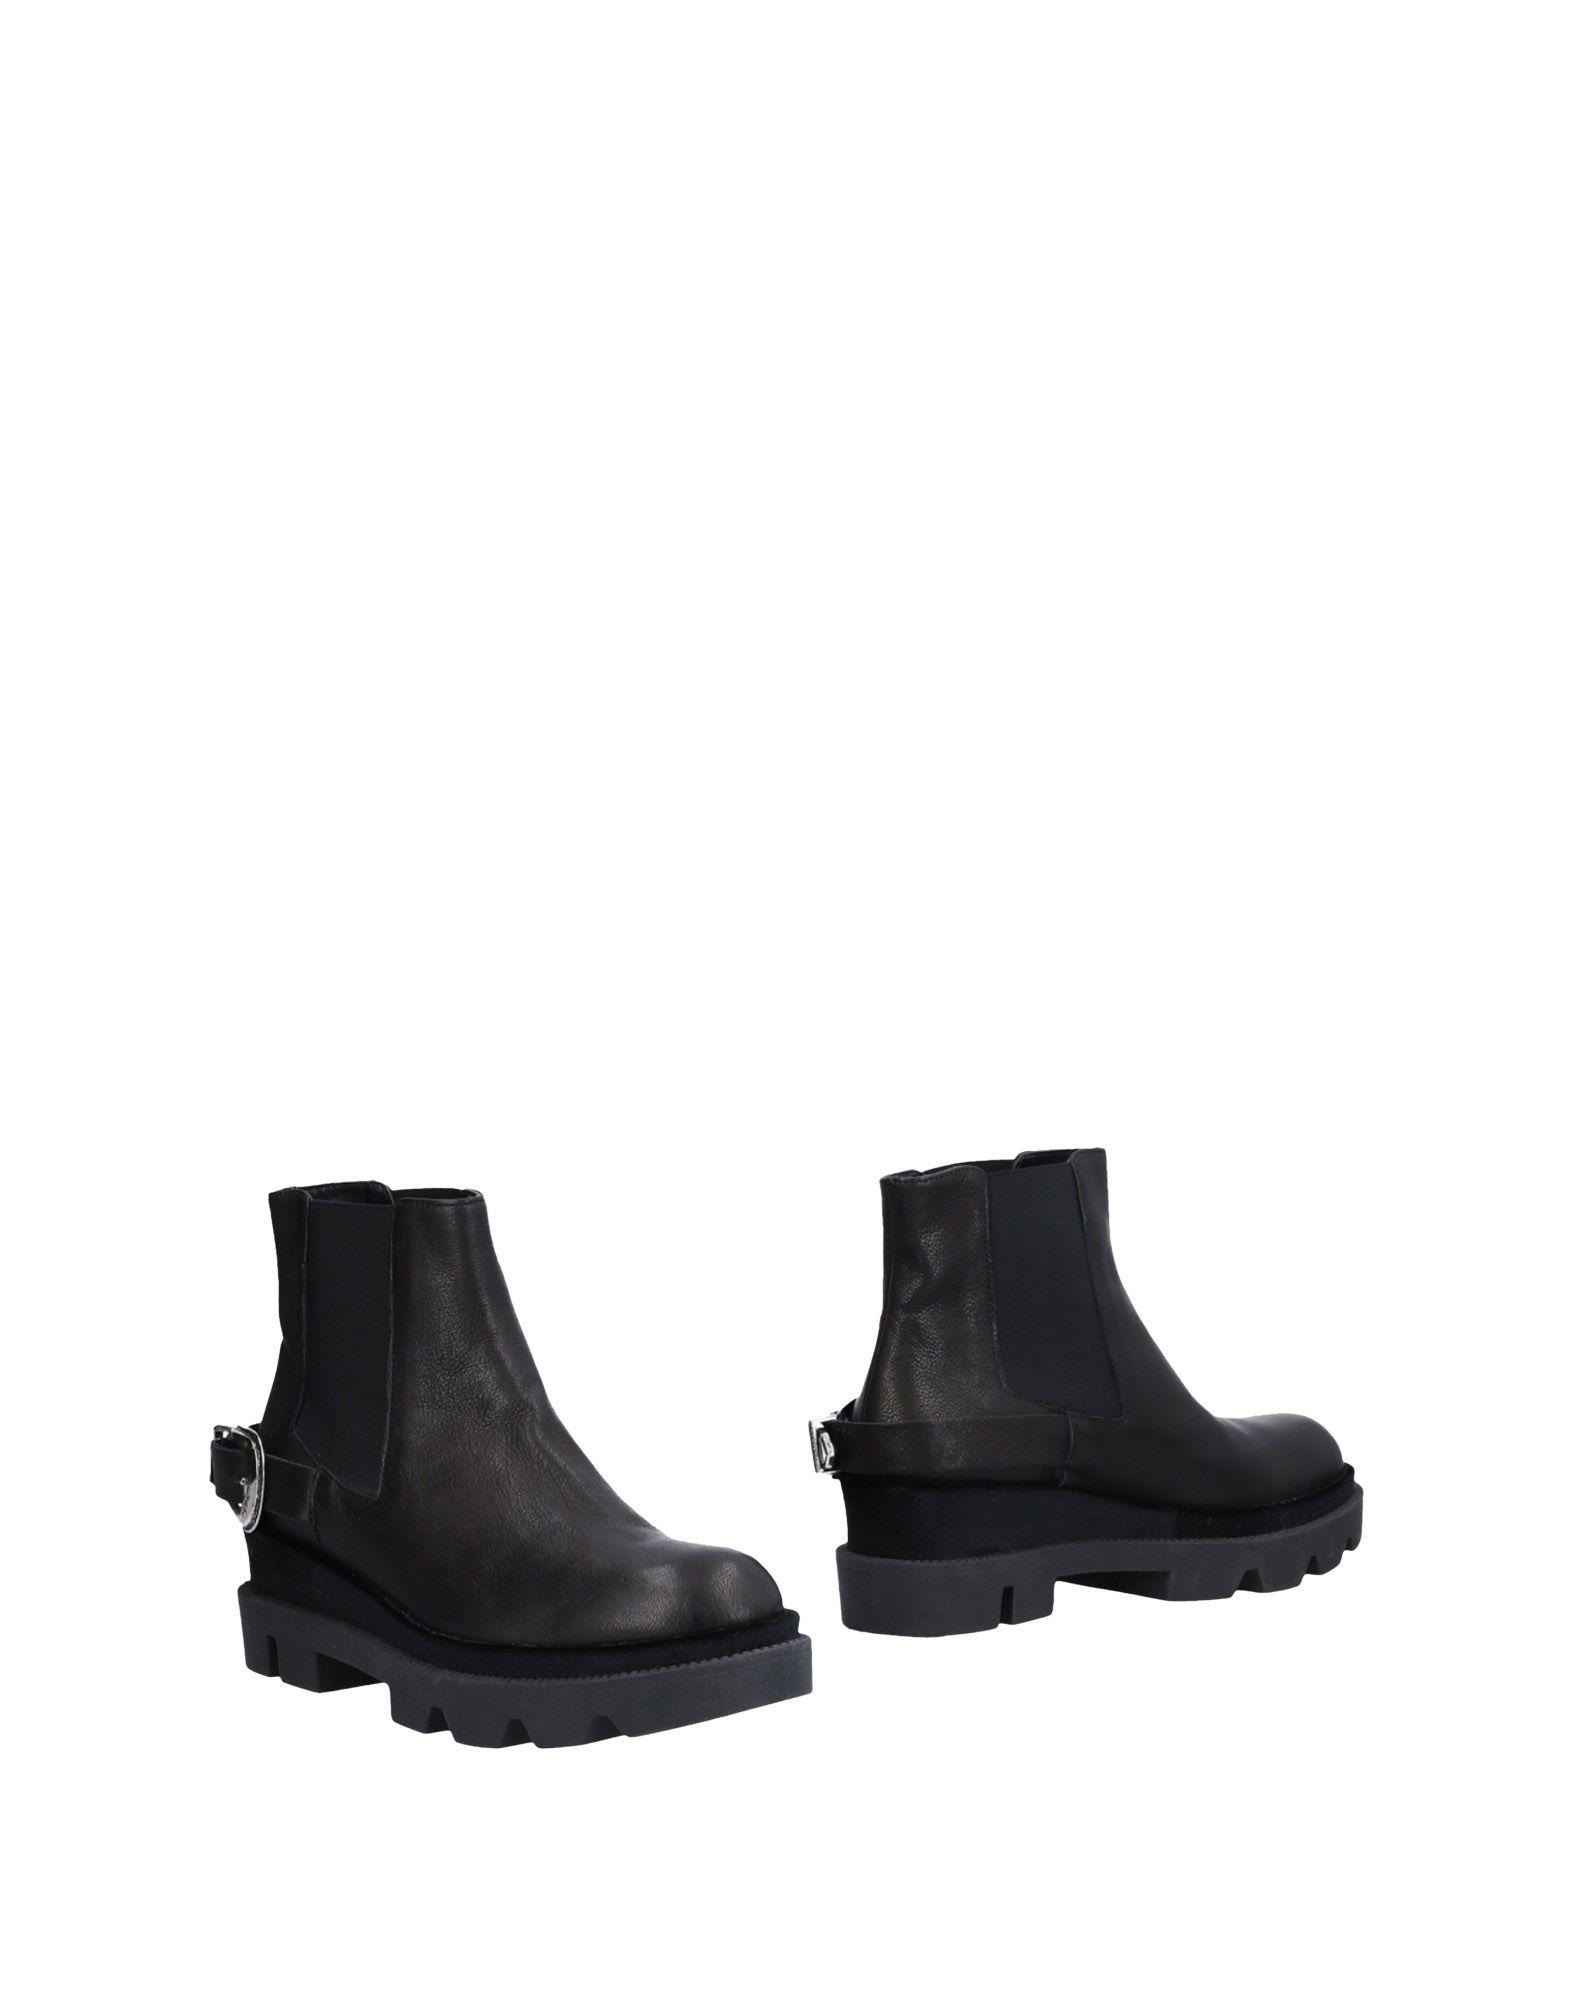 Stilvolle billige Schuhe Tipe E Tacchi 11490477DB Chelsea Boots Damen  11490477DB Tacchi 2ea134